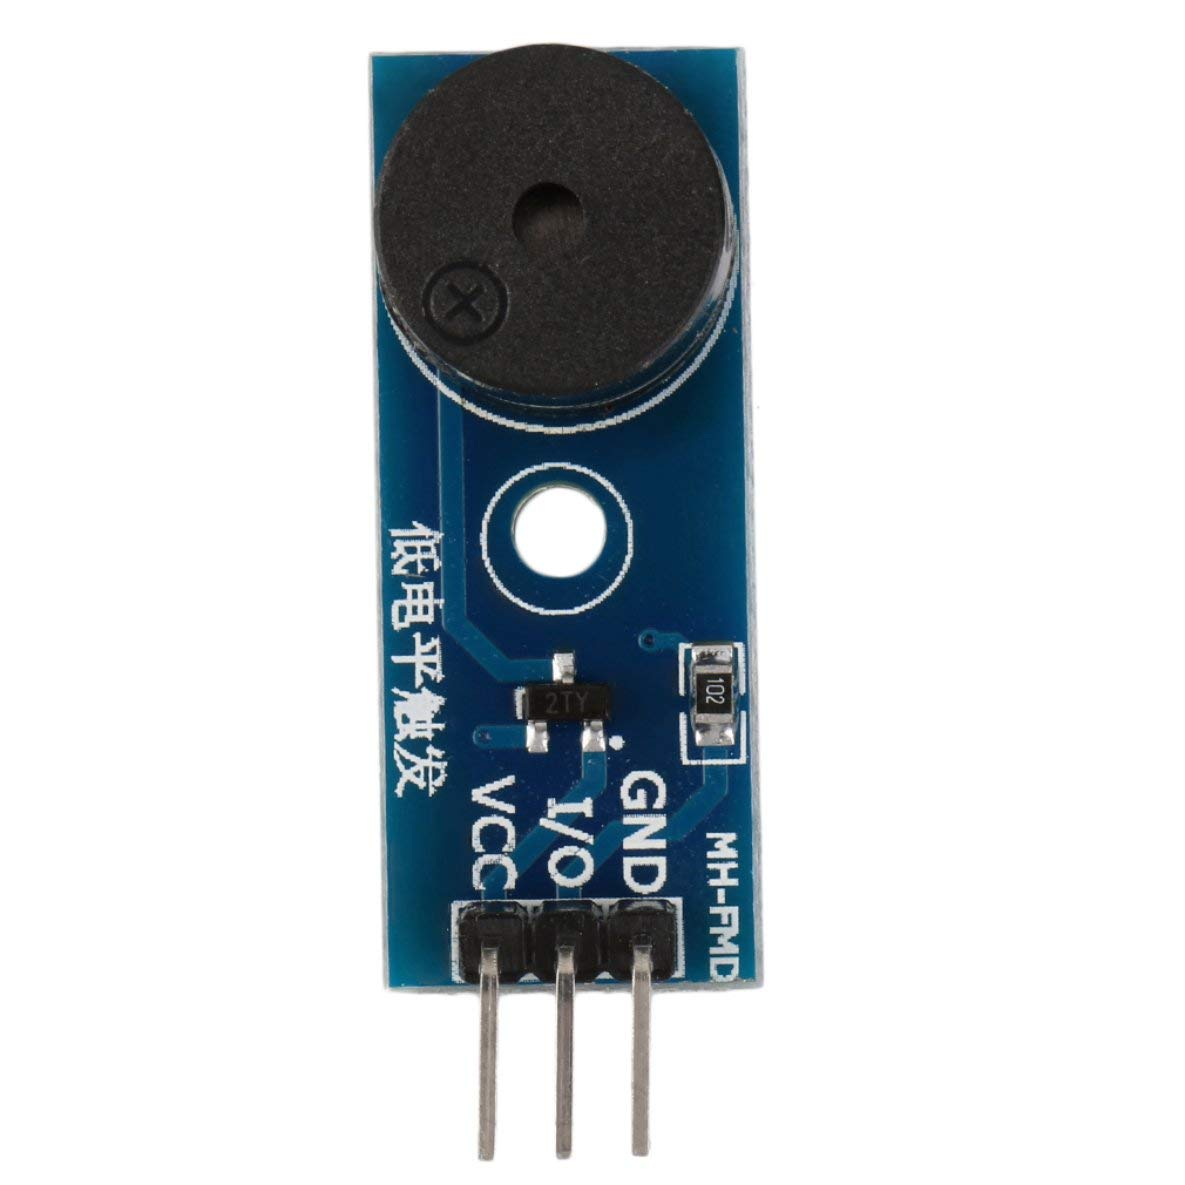 Active Buzzer Alarm Module Sensor Beep Audion Control Panel for Arduino High Quality in Stock Super Deals